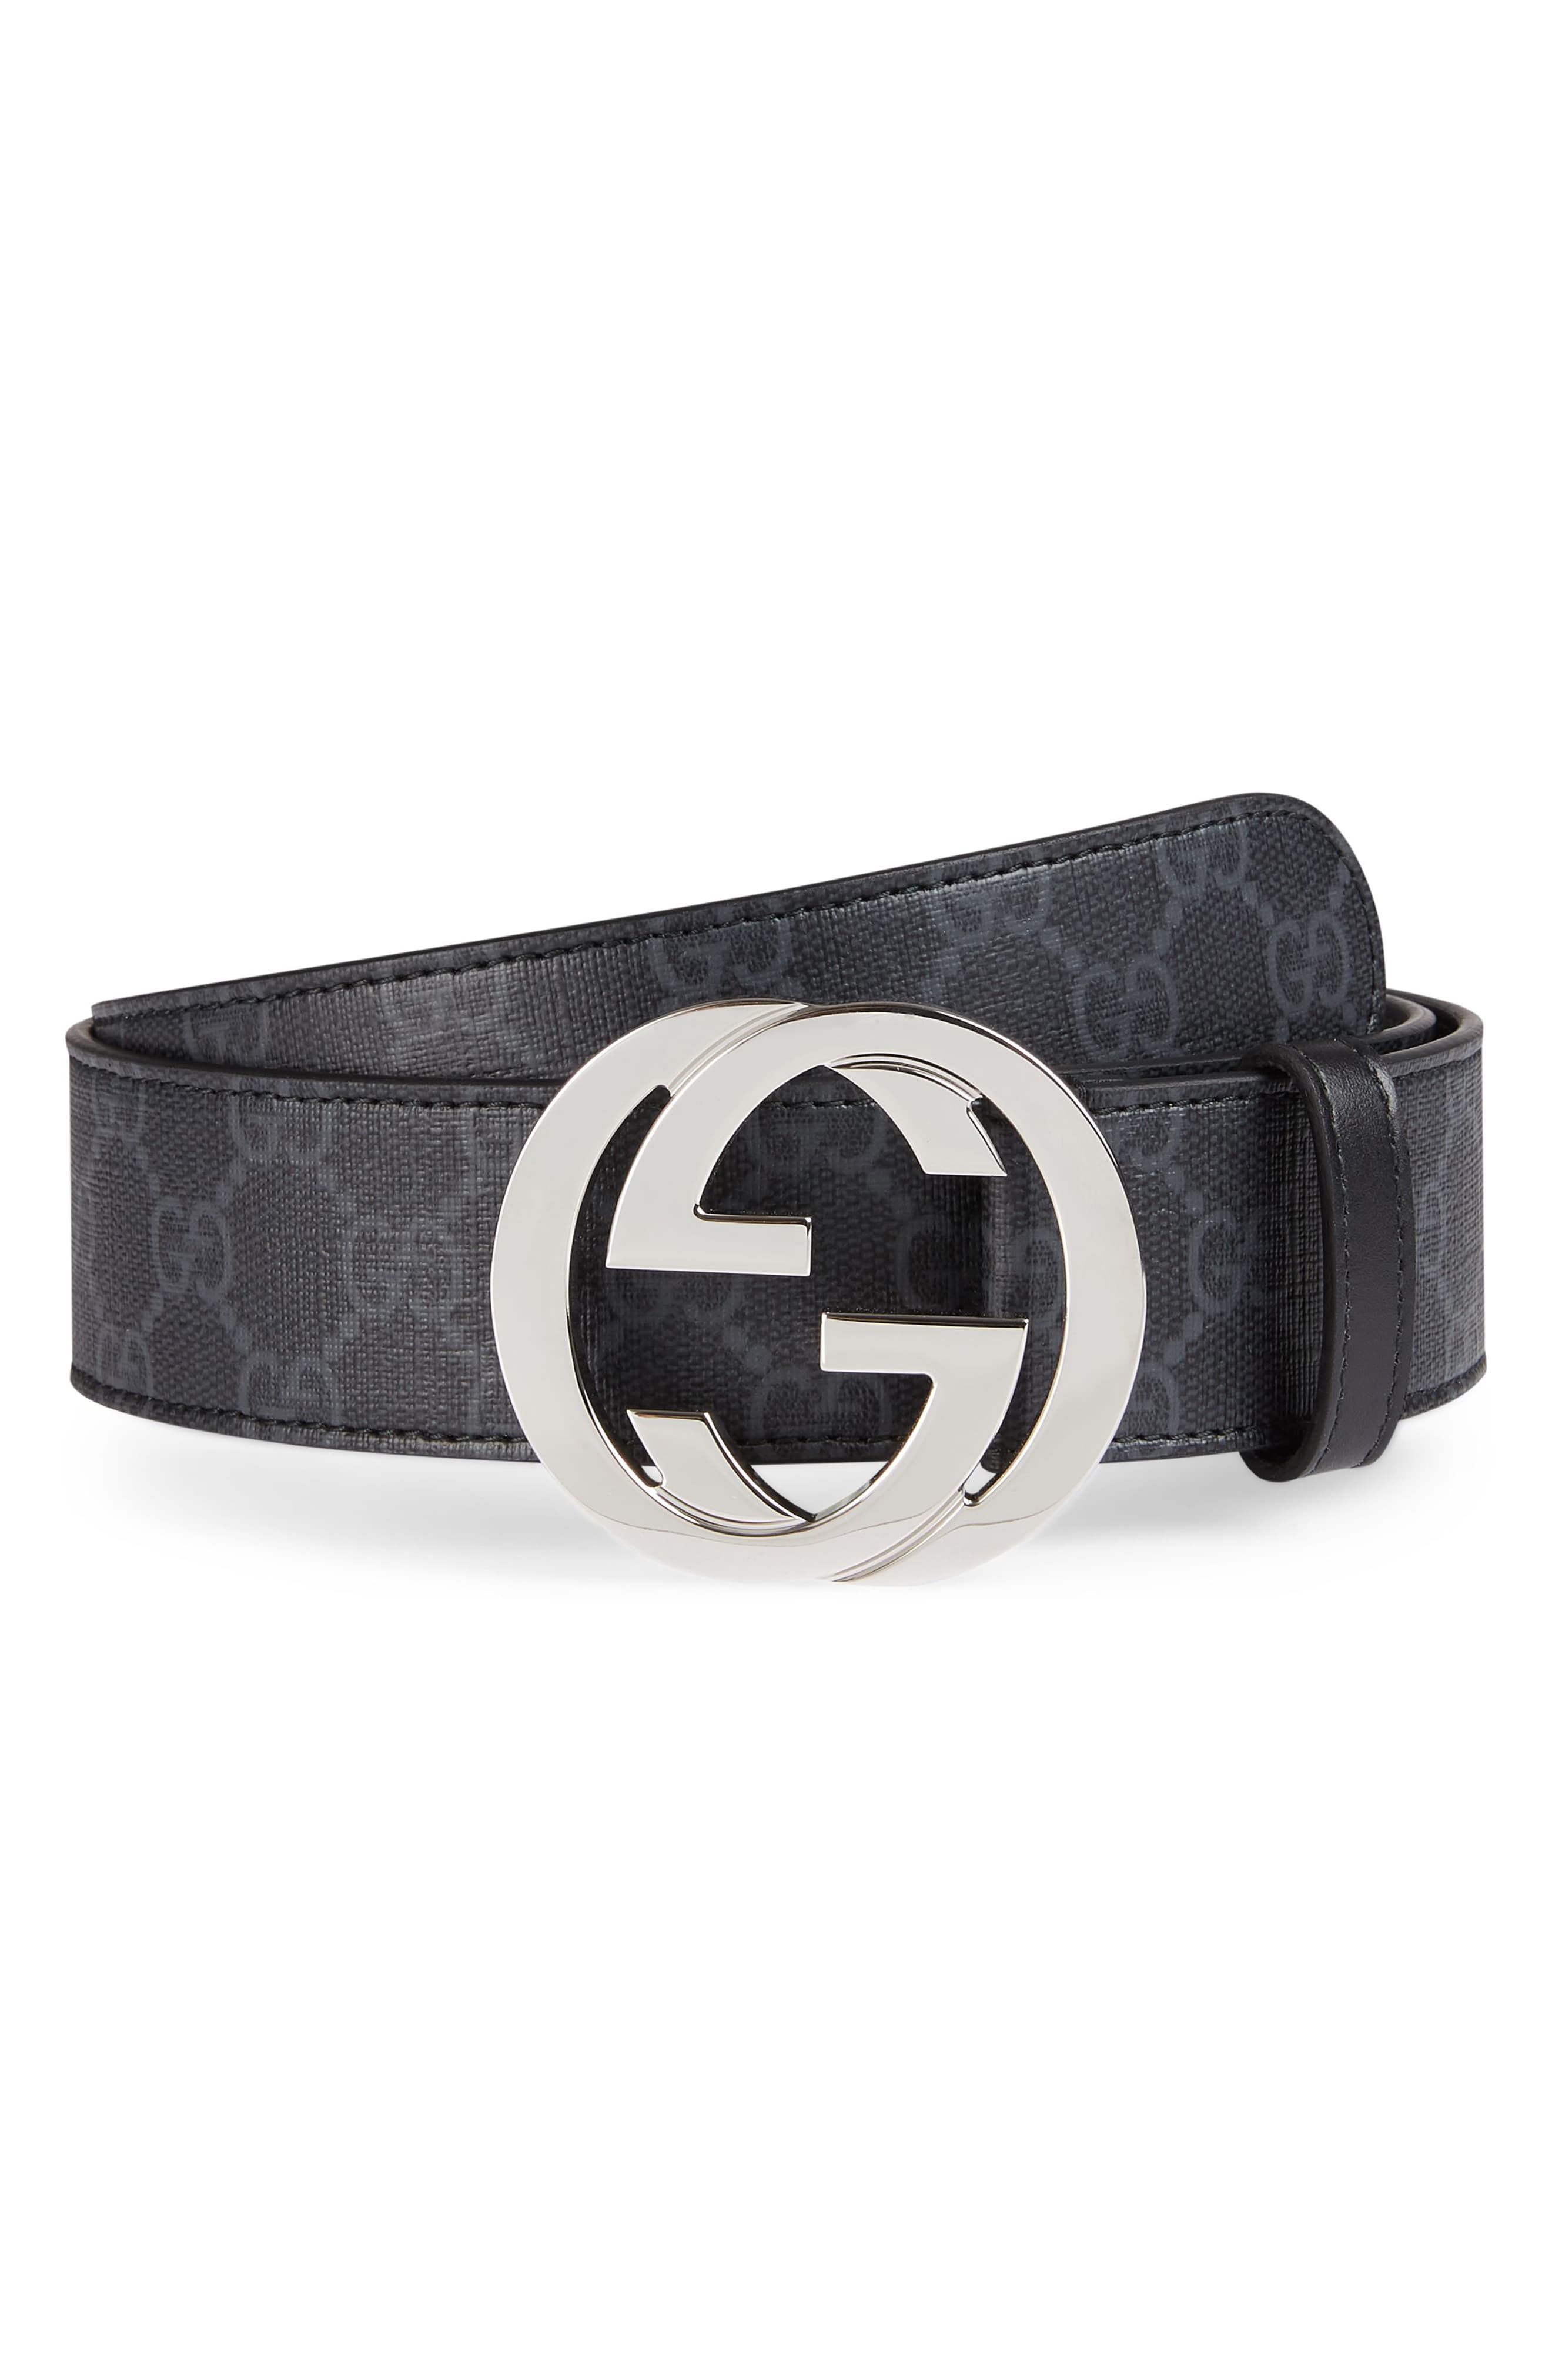 Gucci Logo Buckle Interlocking Belt Belt, Gucci, Gucci